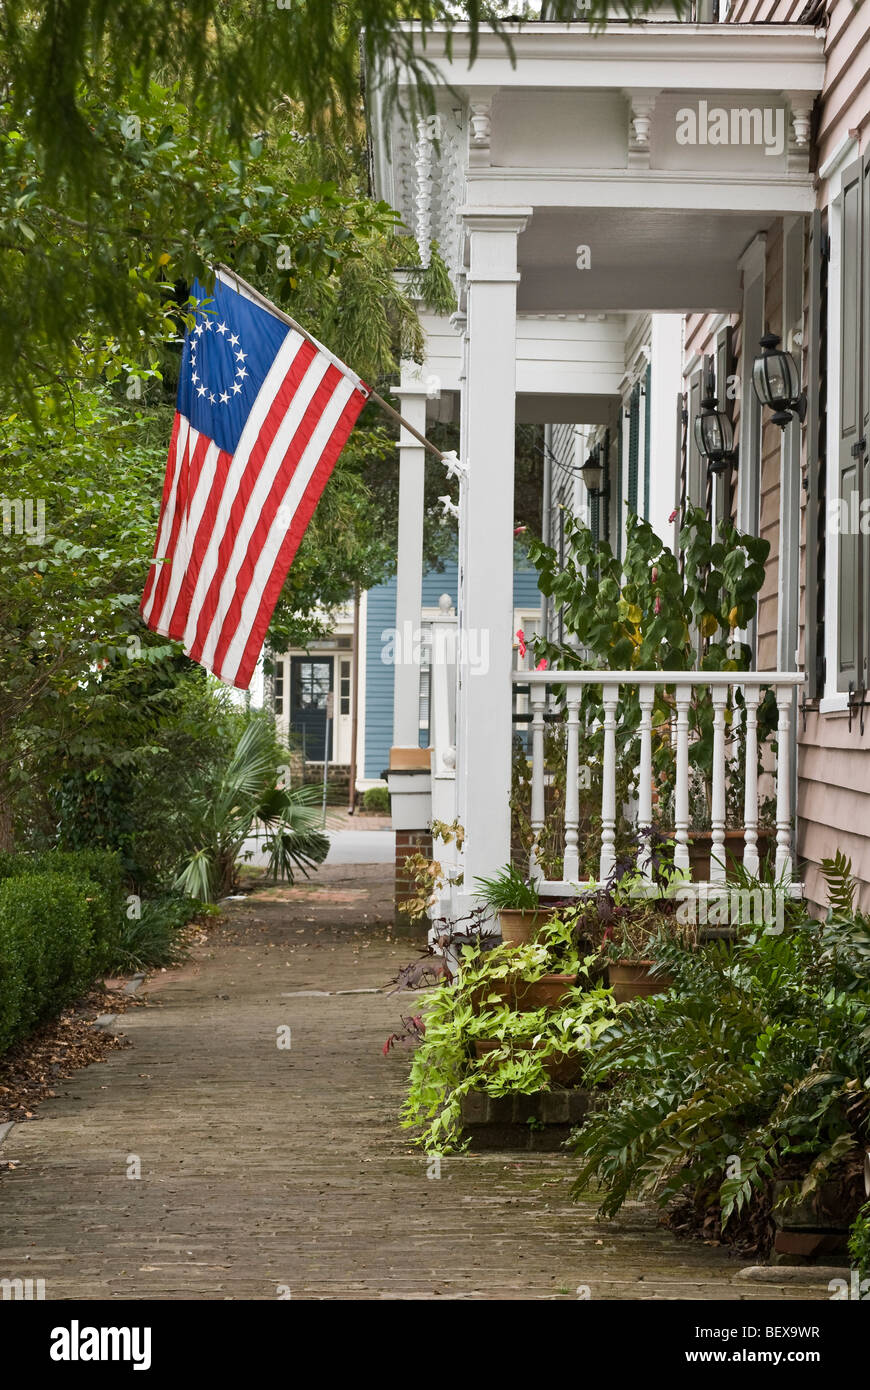 American flag on porch of house, Savannah, Georgia, USA - Stock Image